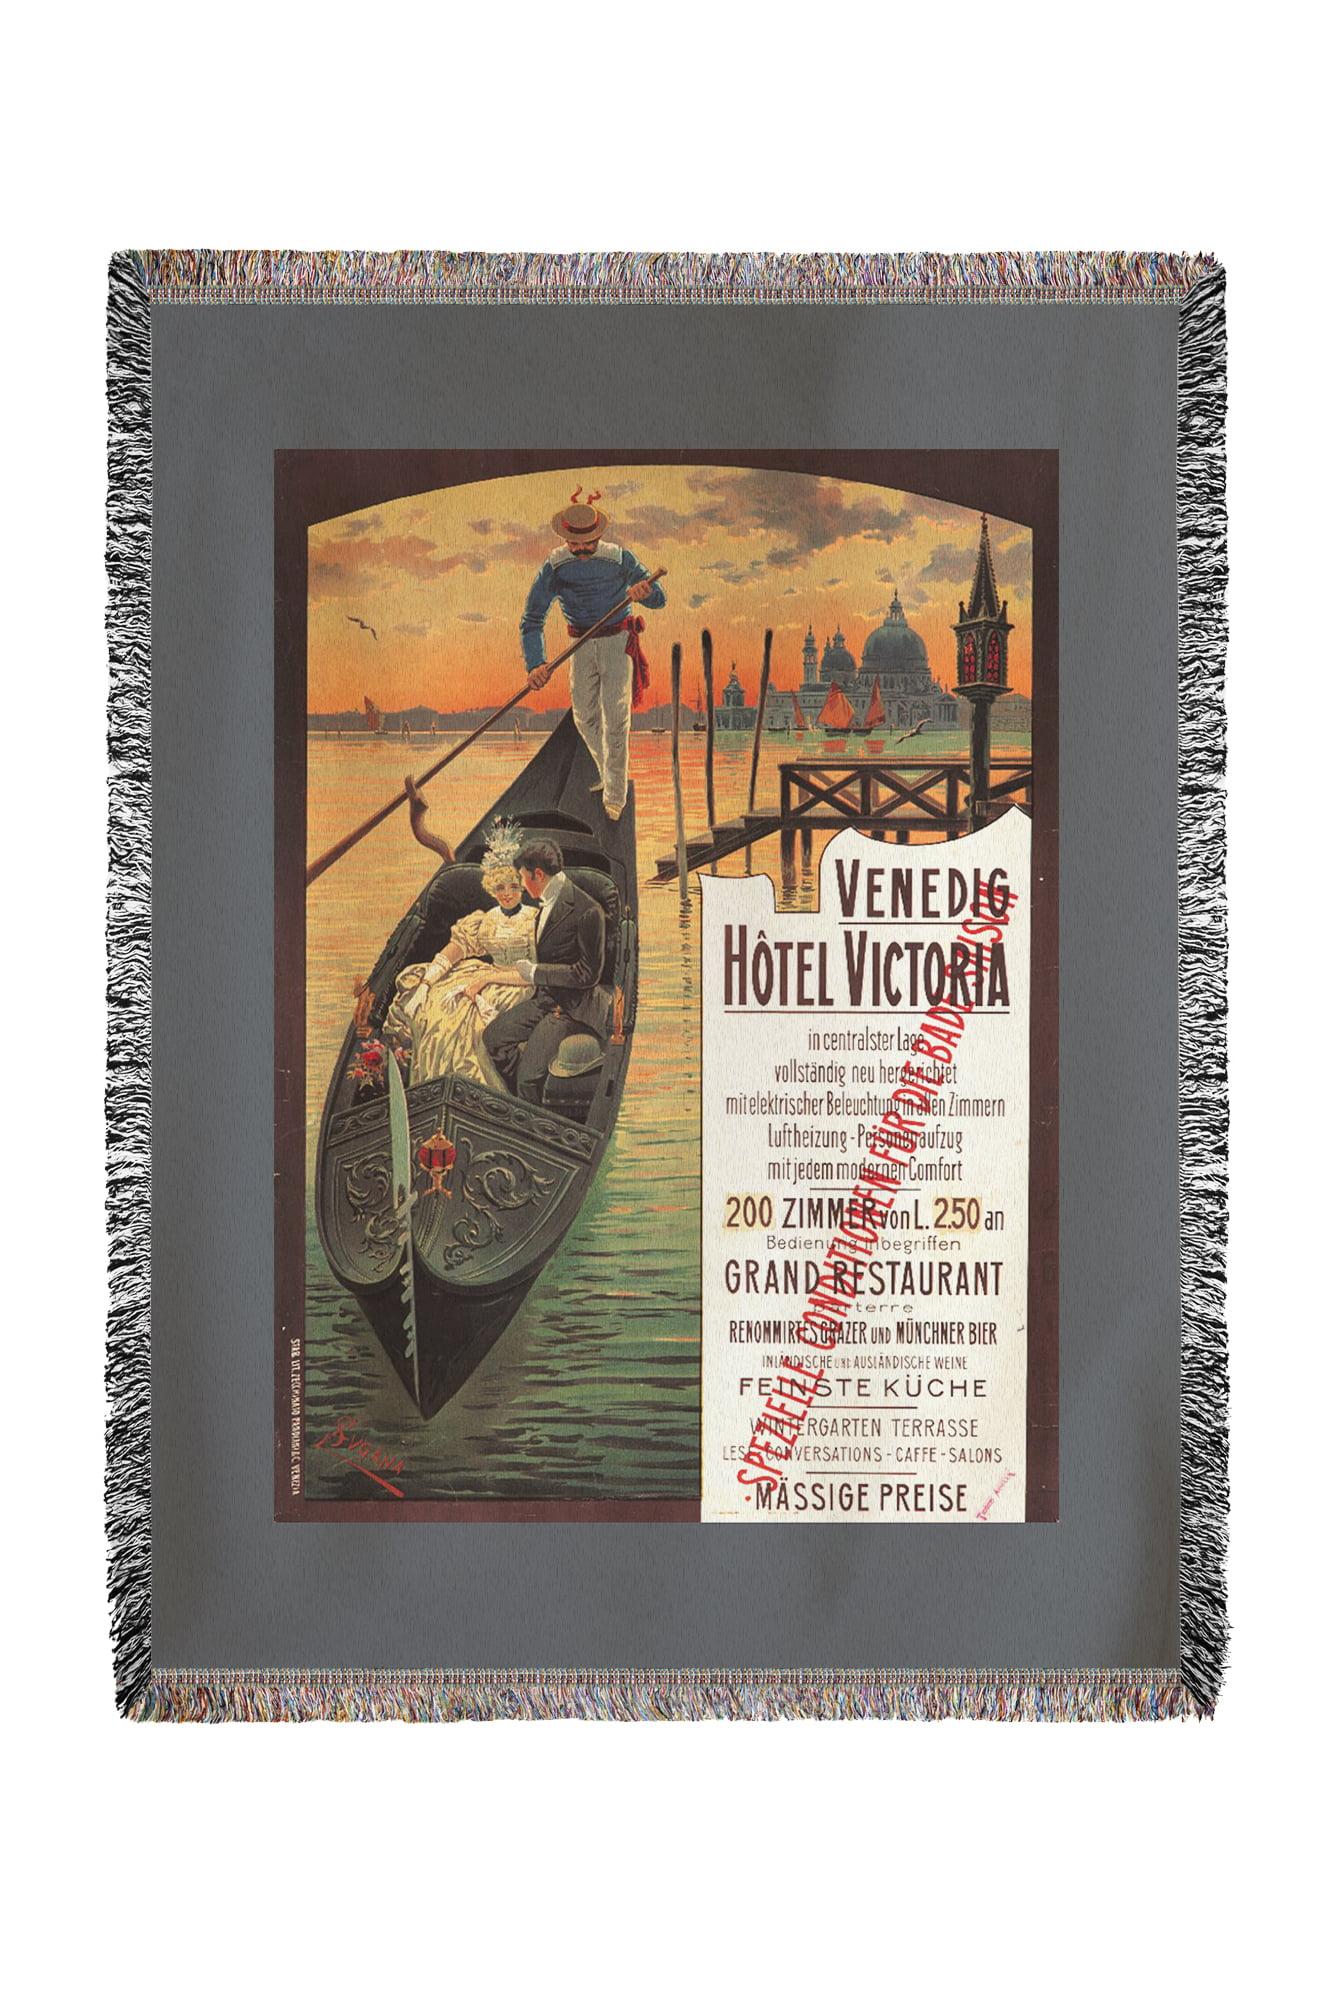 Venedig Hotel Victoria Vintage Poster Artist Lugana Suzanne